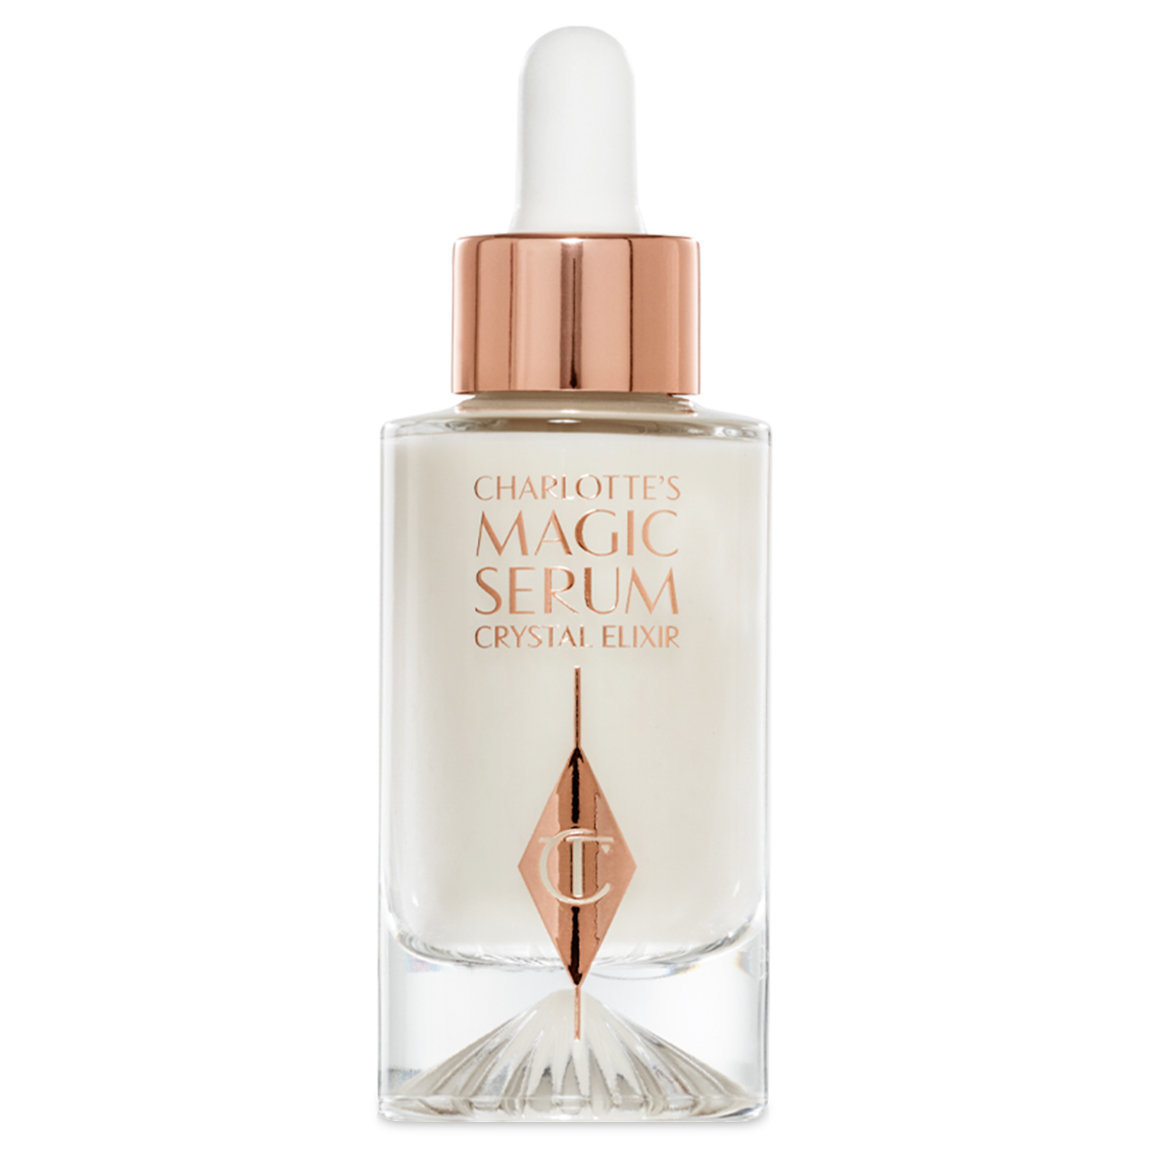 Charlotte Tilbury Charlotte's Magic Serum Crystal Elixir 30 ml alternative view 1 - product swatch.